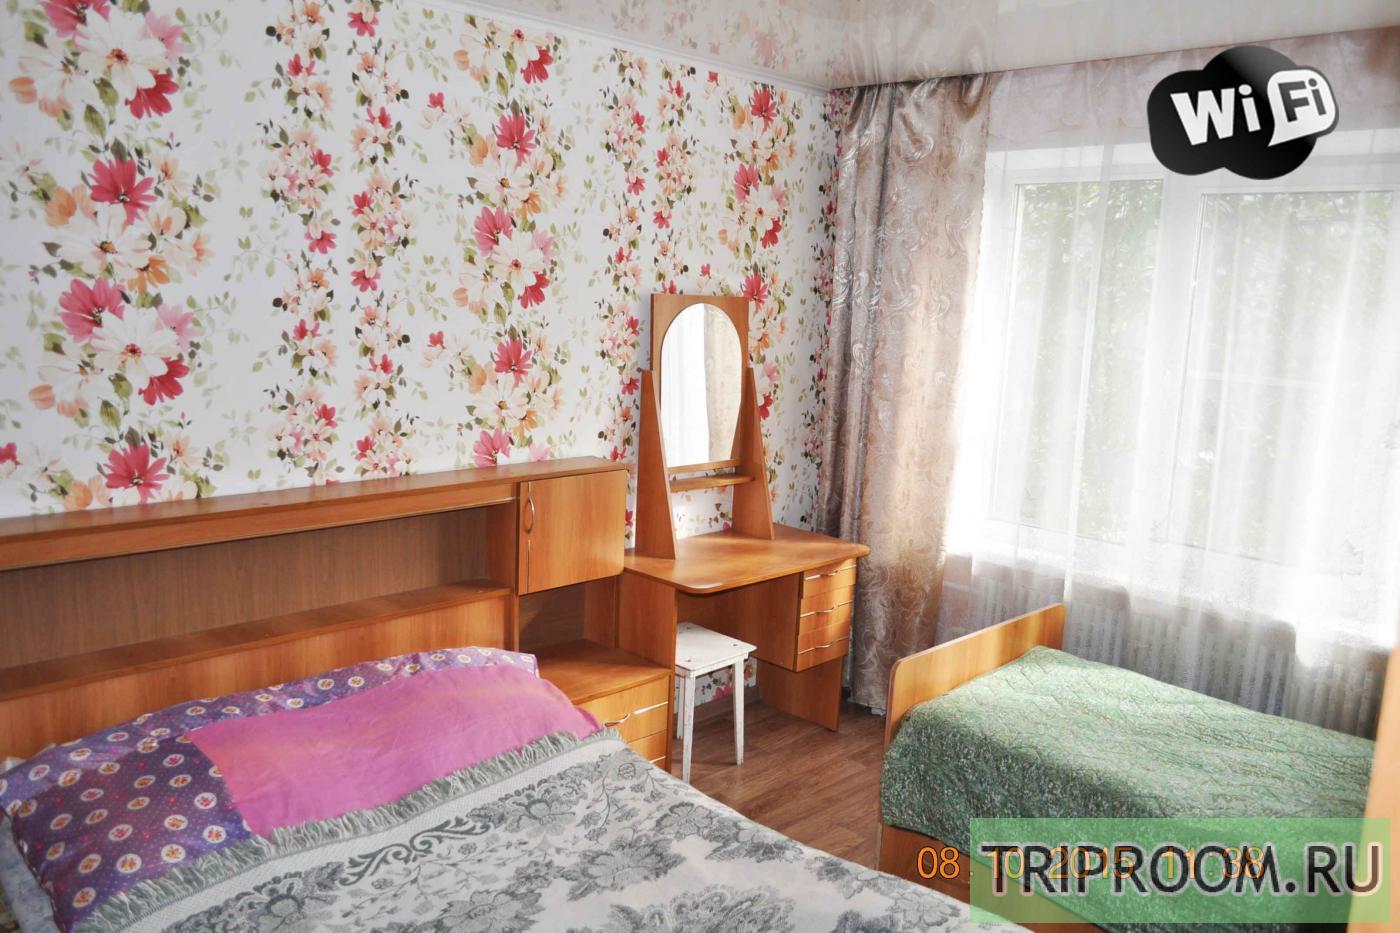 2-комнатная квартира посуточно (вариант № 11708), ул. Амосова улица, фото № 21